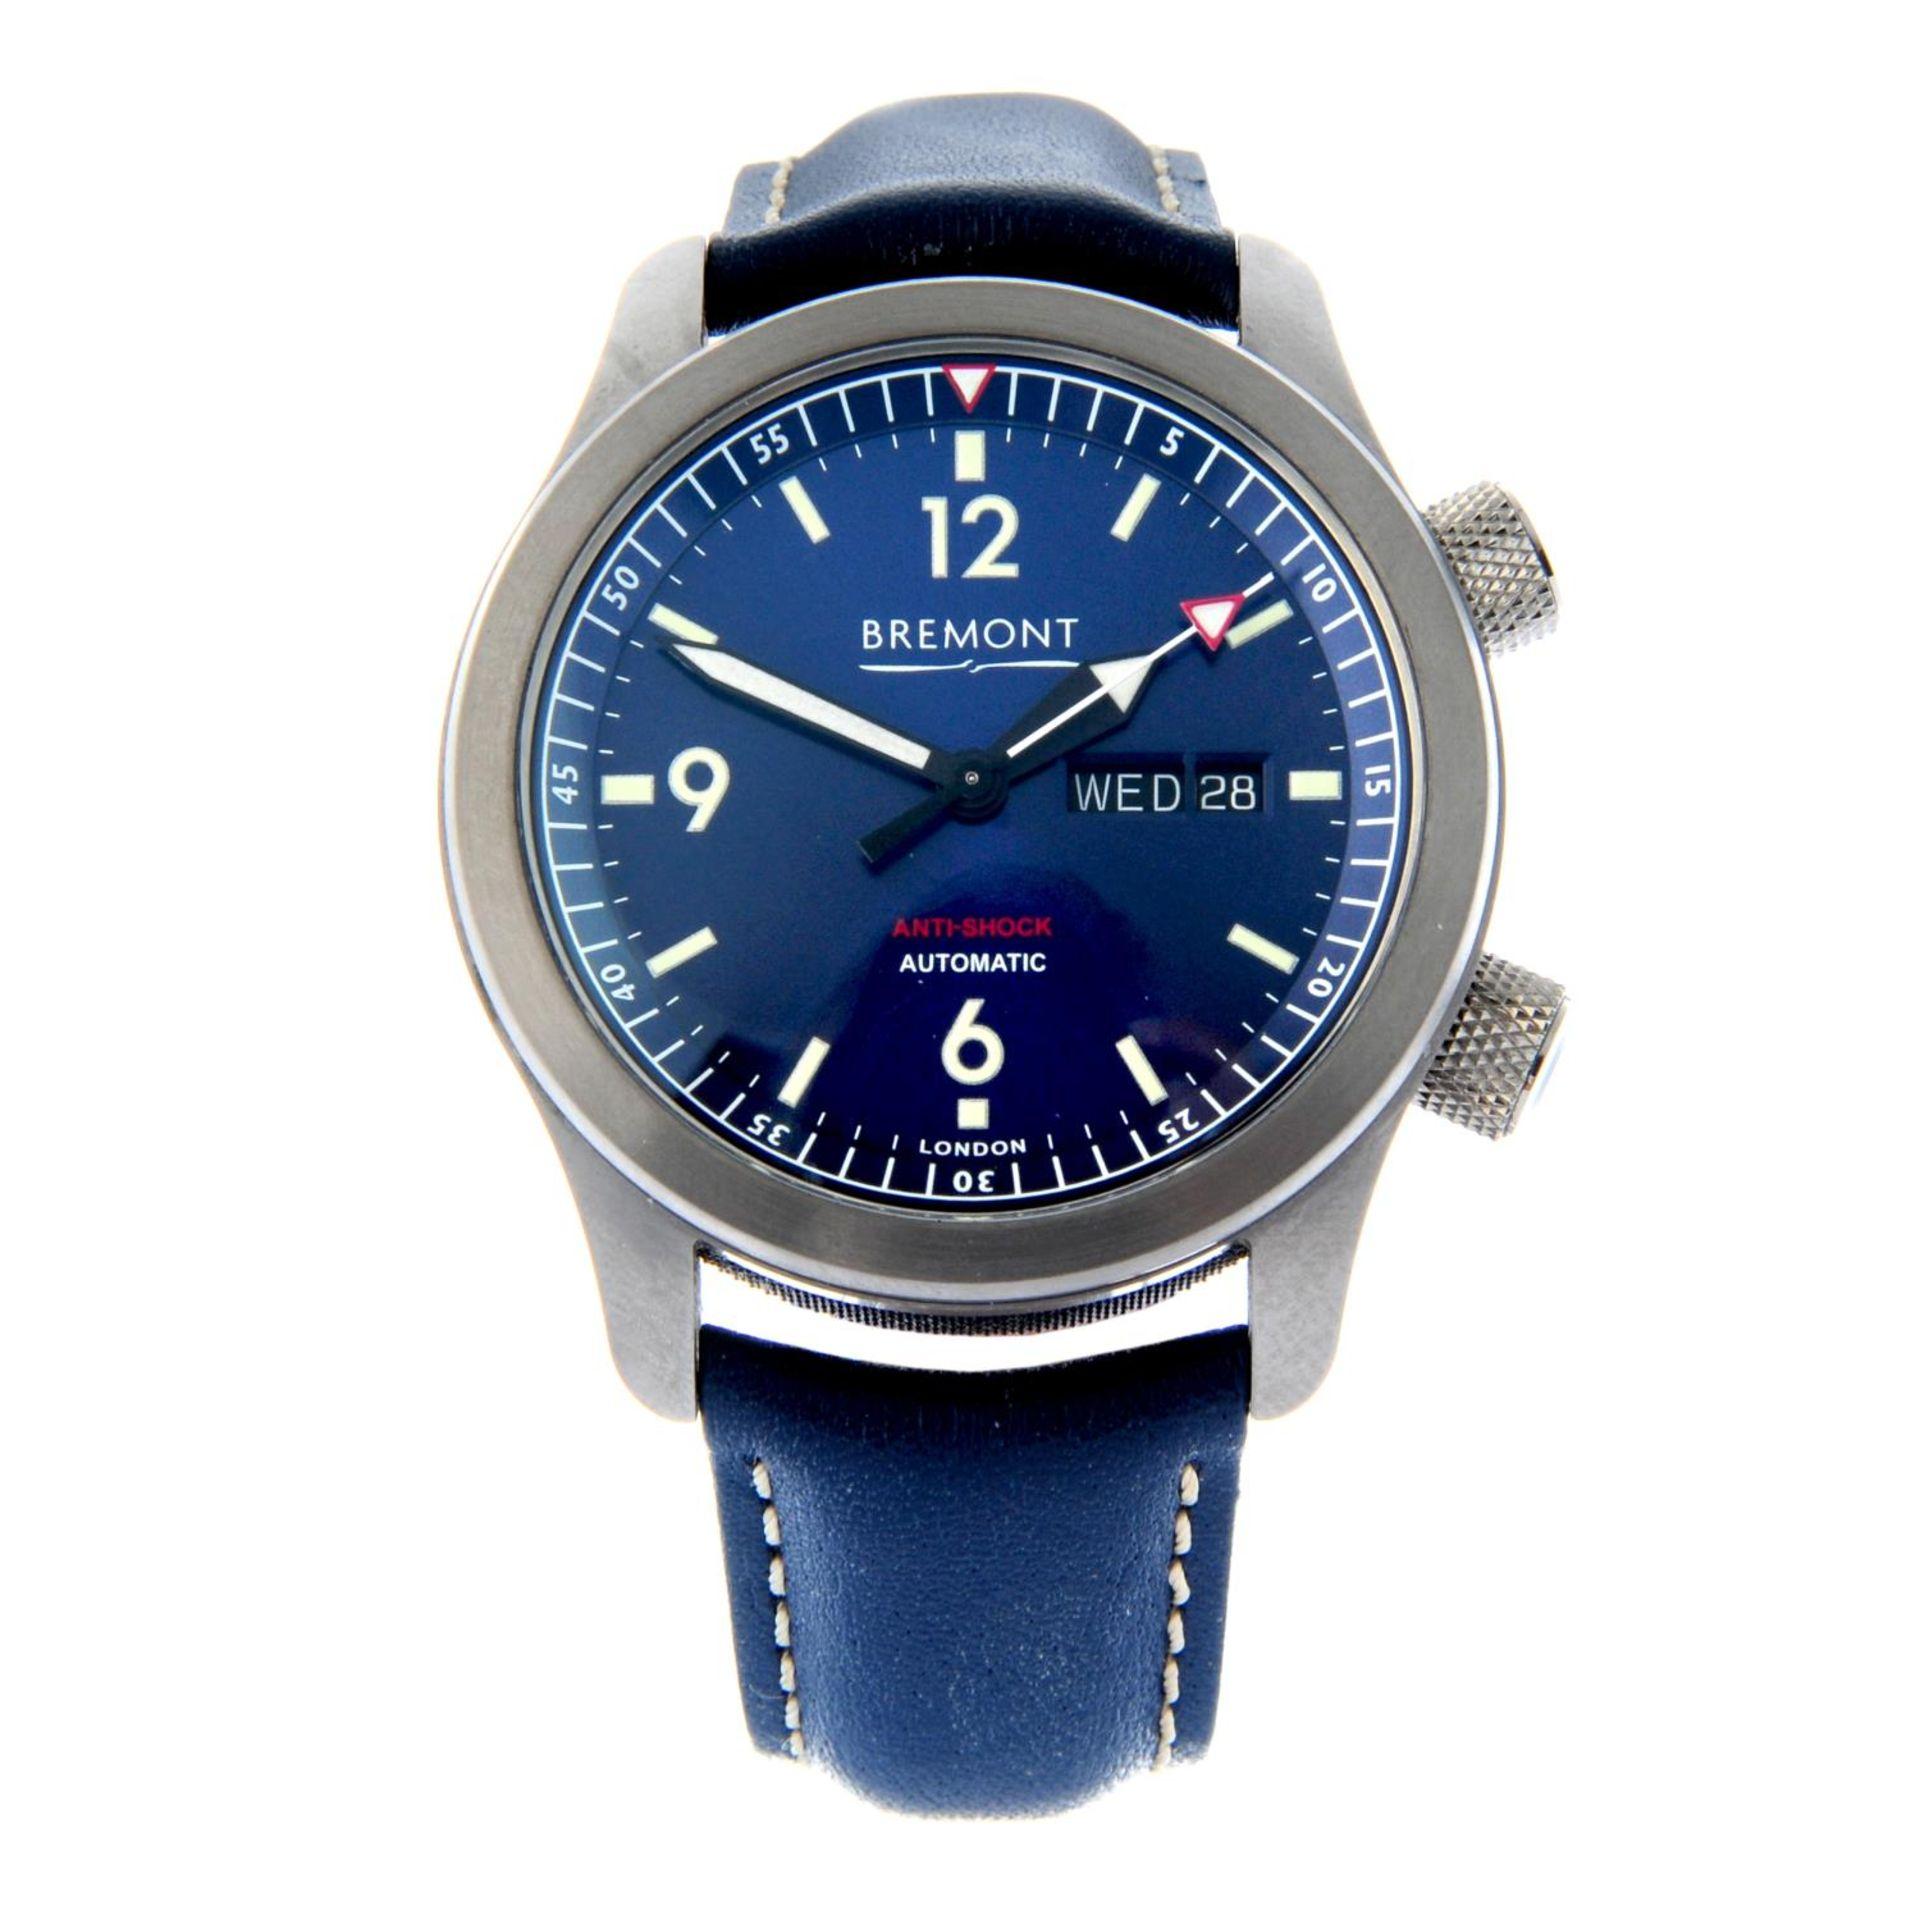 BREMONT - a U2 wrist watch.